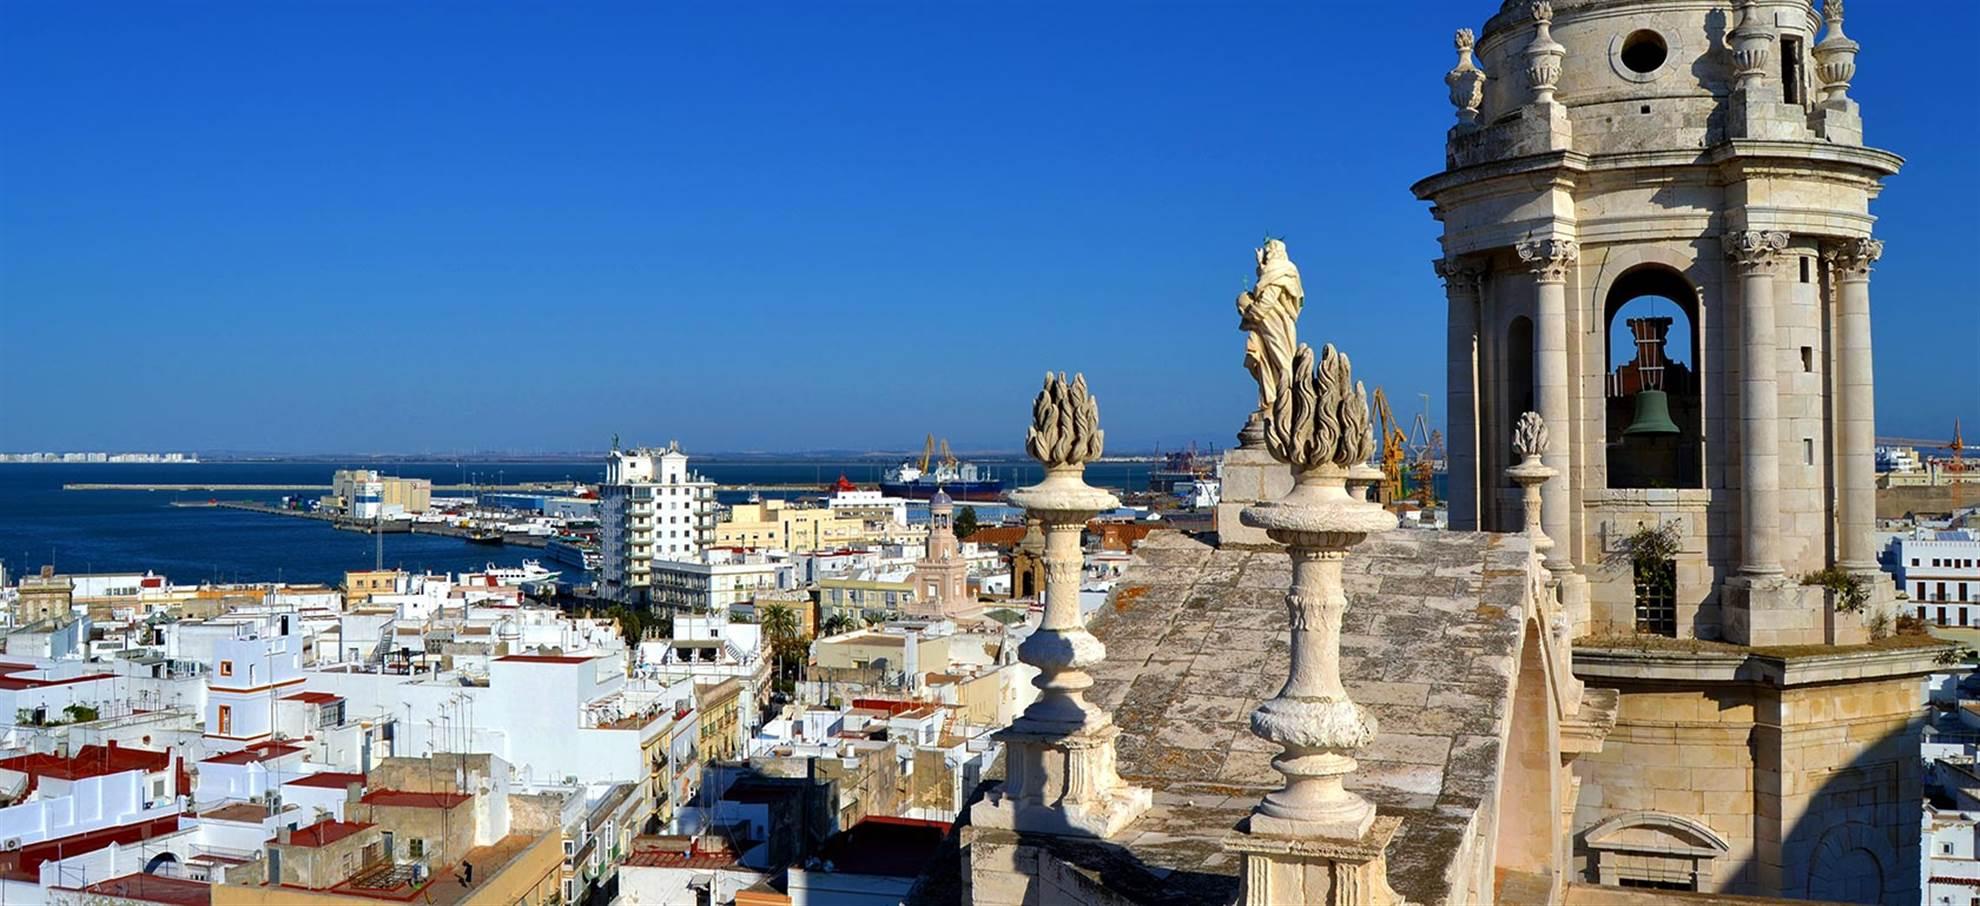 Jerez e Cádiz. Vino, cavalli e luce (SVQJECAD)